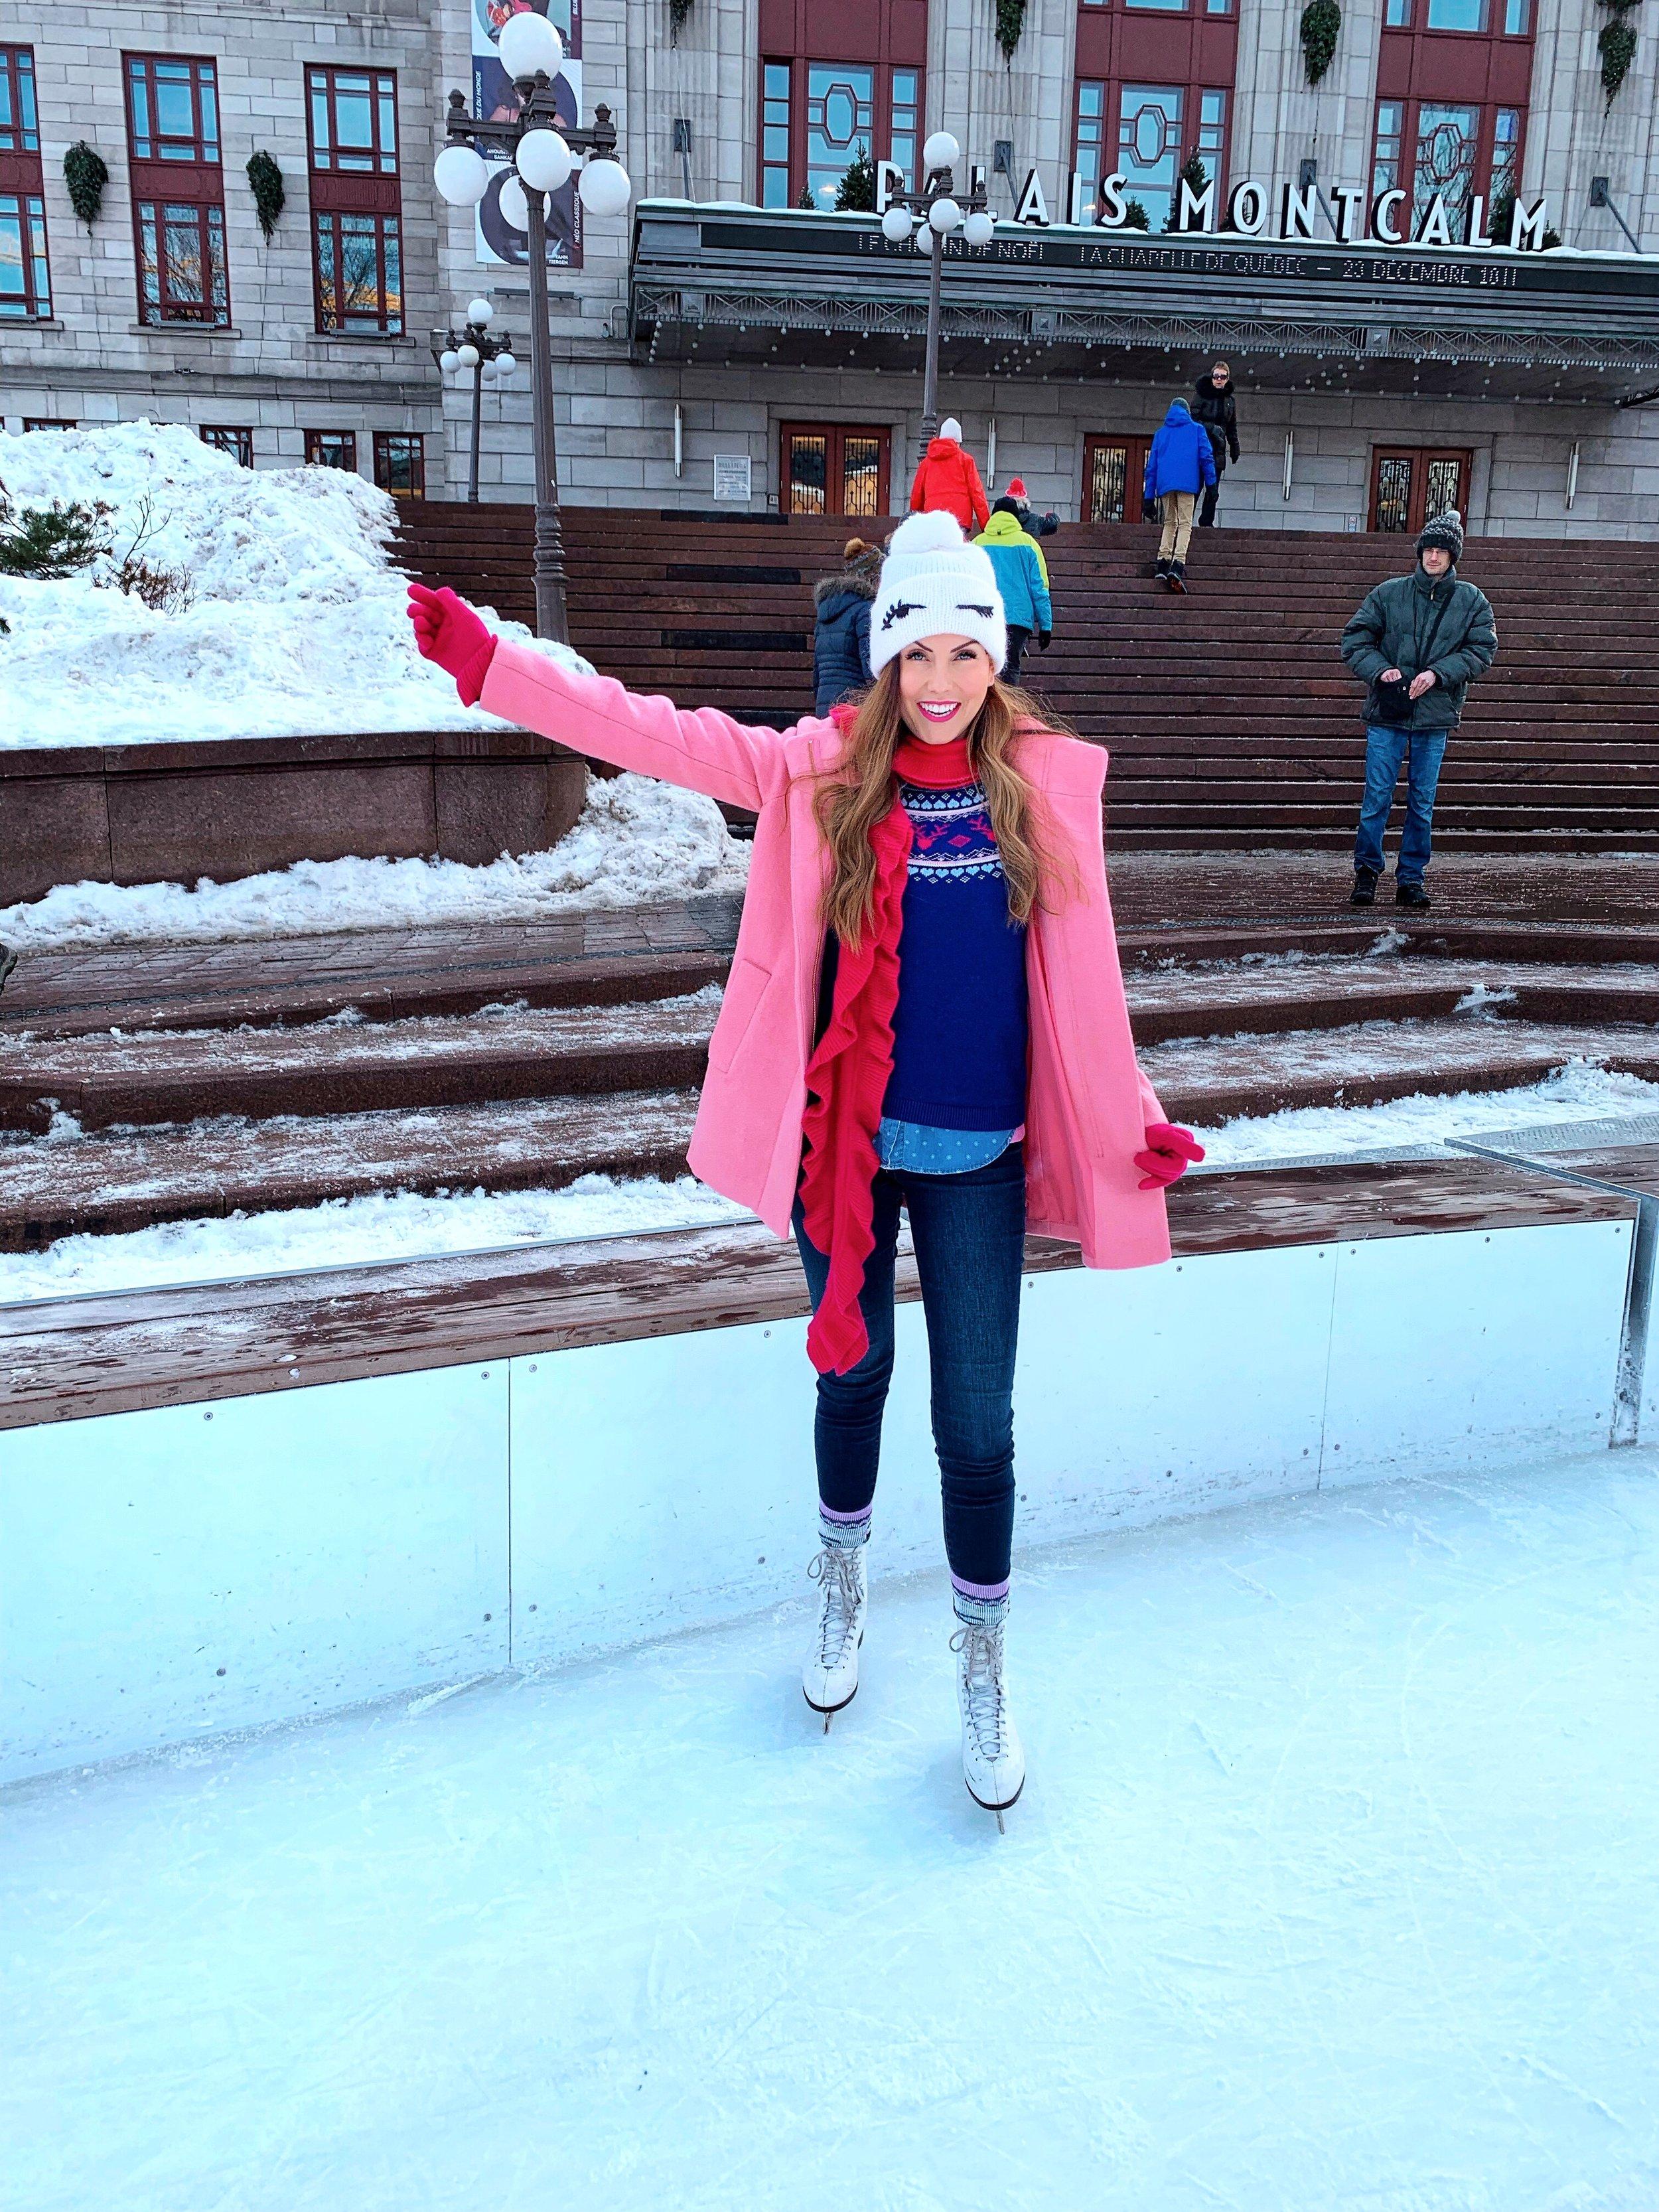 quebec city ice skating coat.jpg